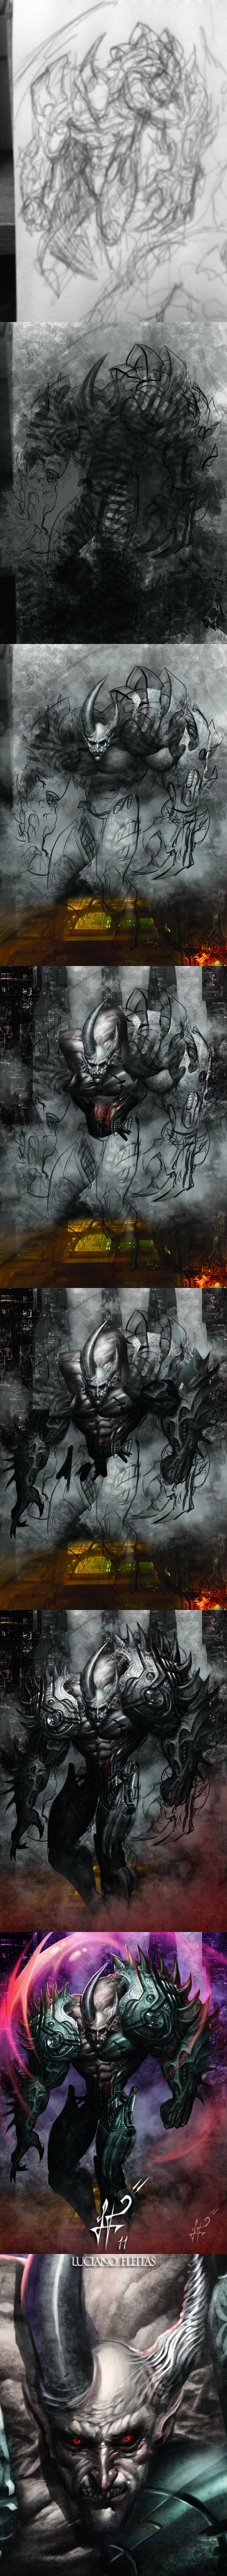 Cyborg process by demitrybelmont